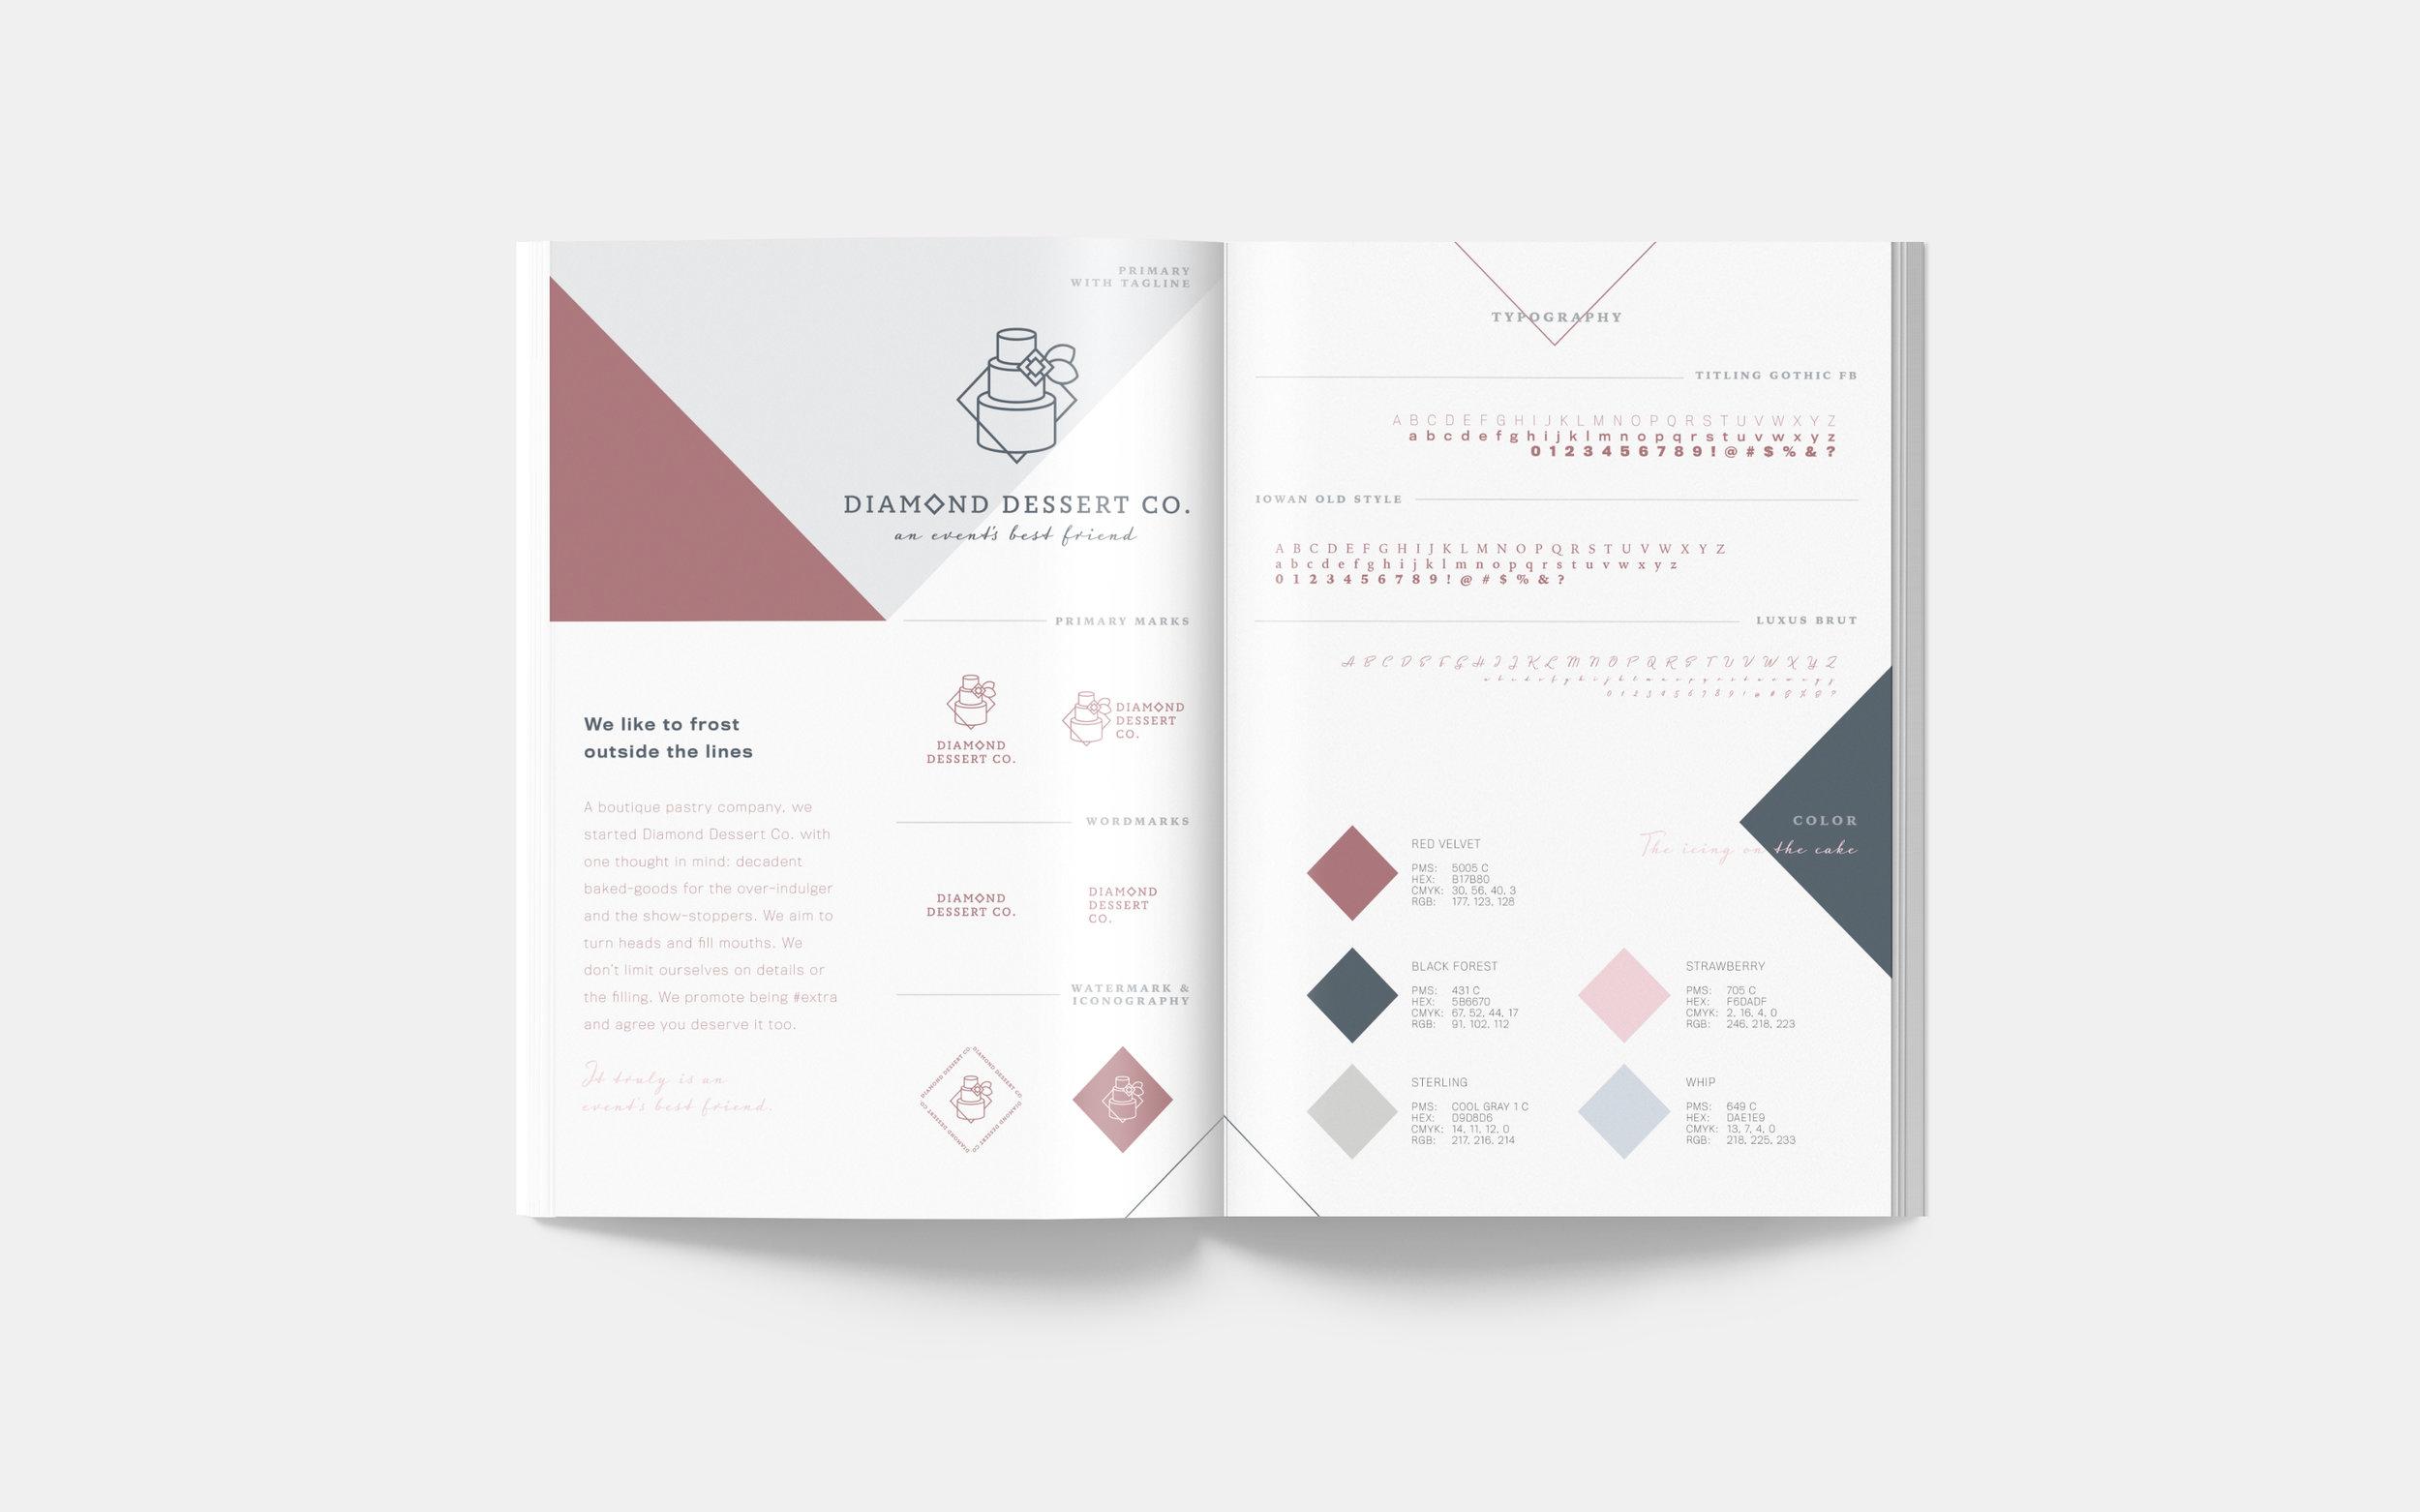 DiamondDessertCo-Brand-Identity-by-PresuttiDesign.jpg